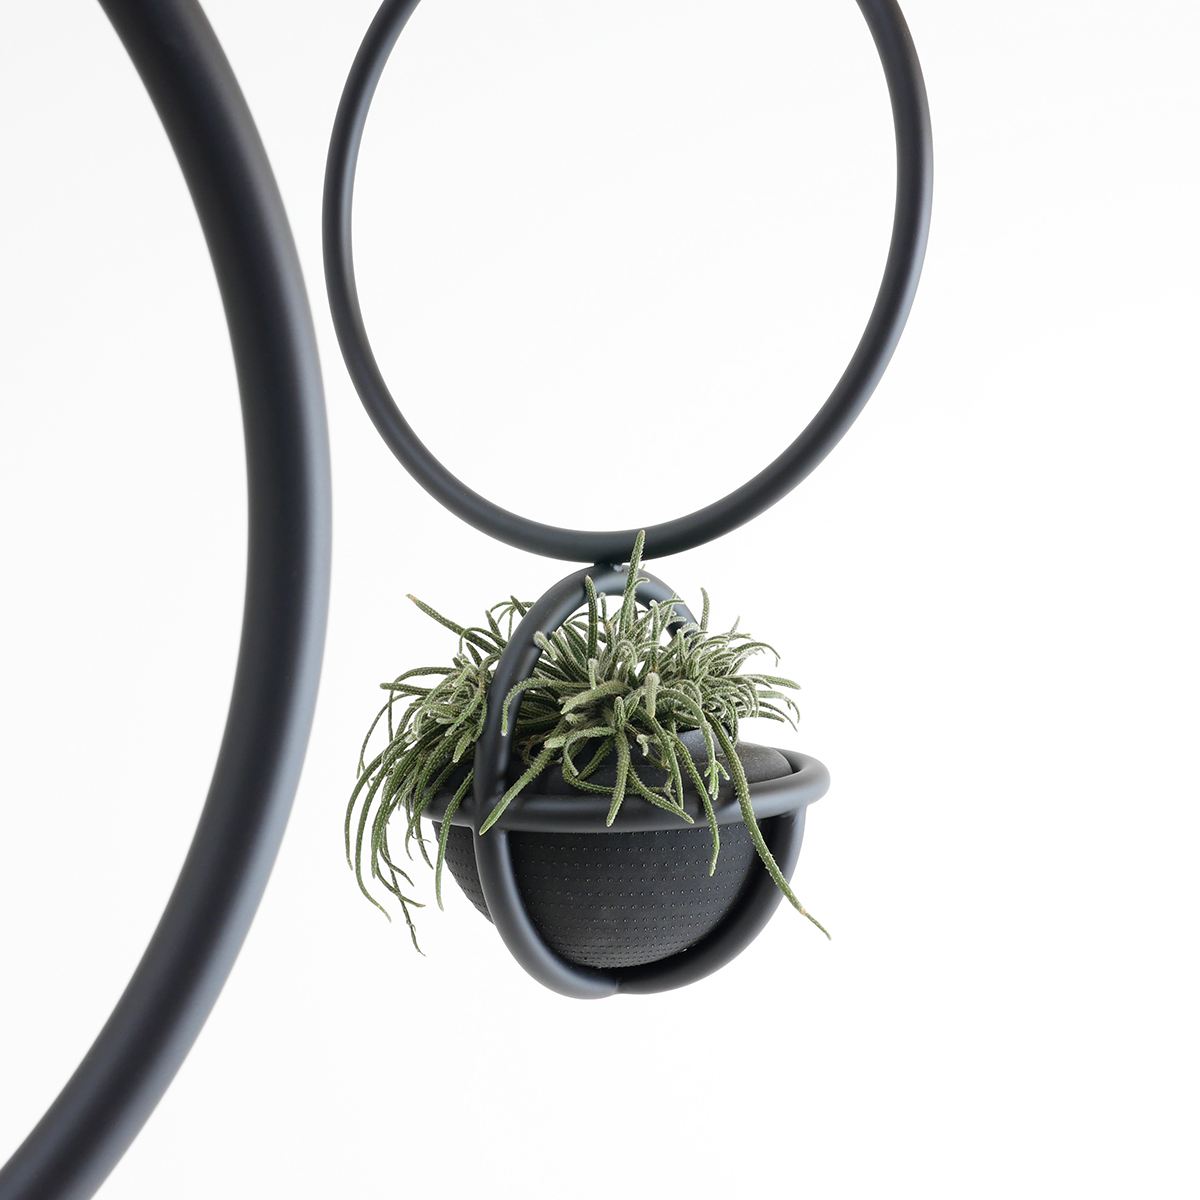 Blumenkugel, hangingplants object from Zascho Petkow and Andreas Haussmann, vase from Birgit Severin